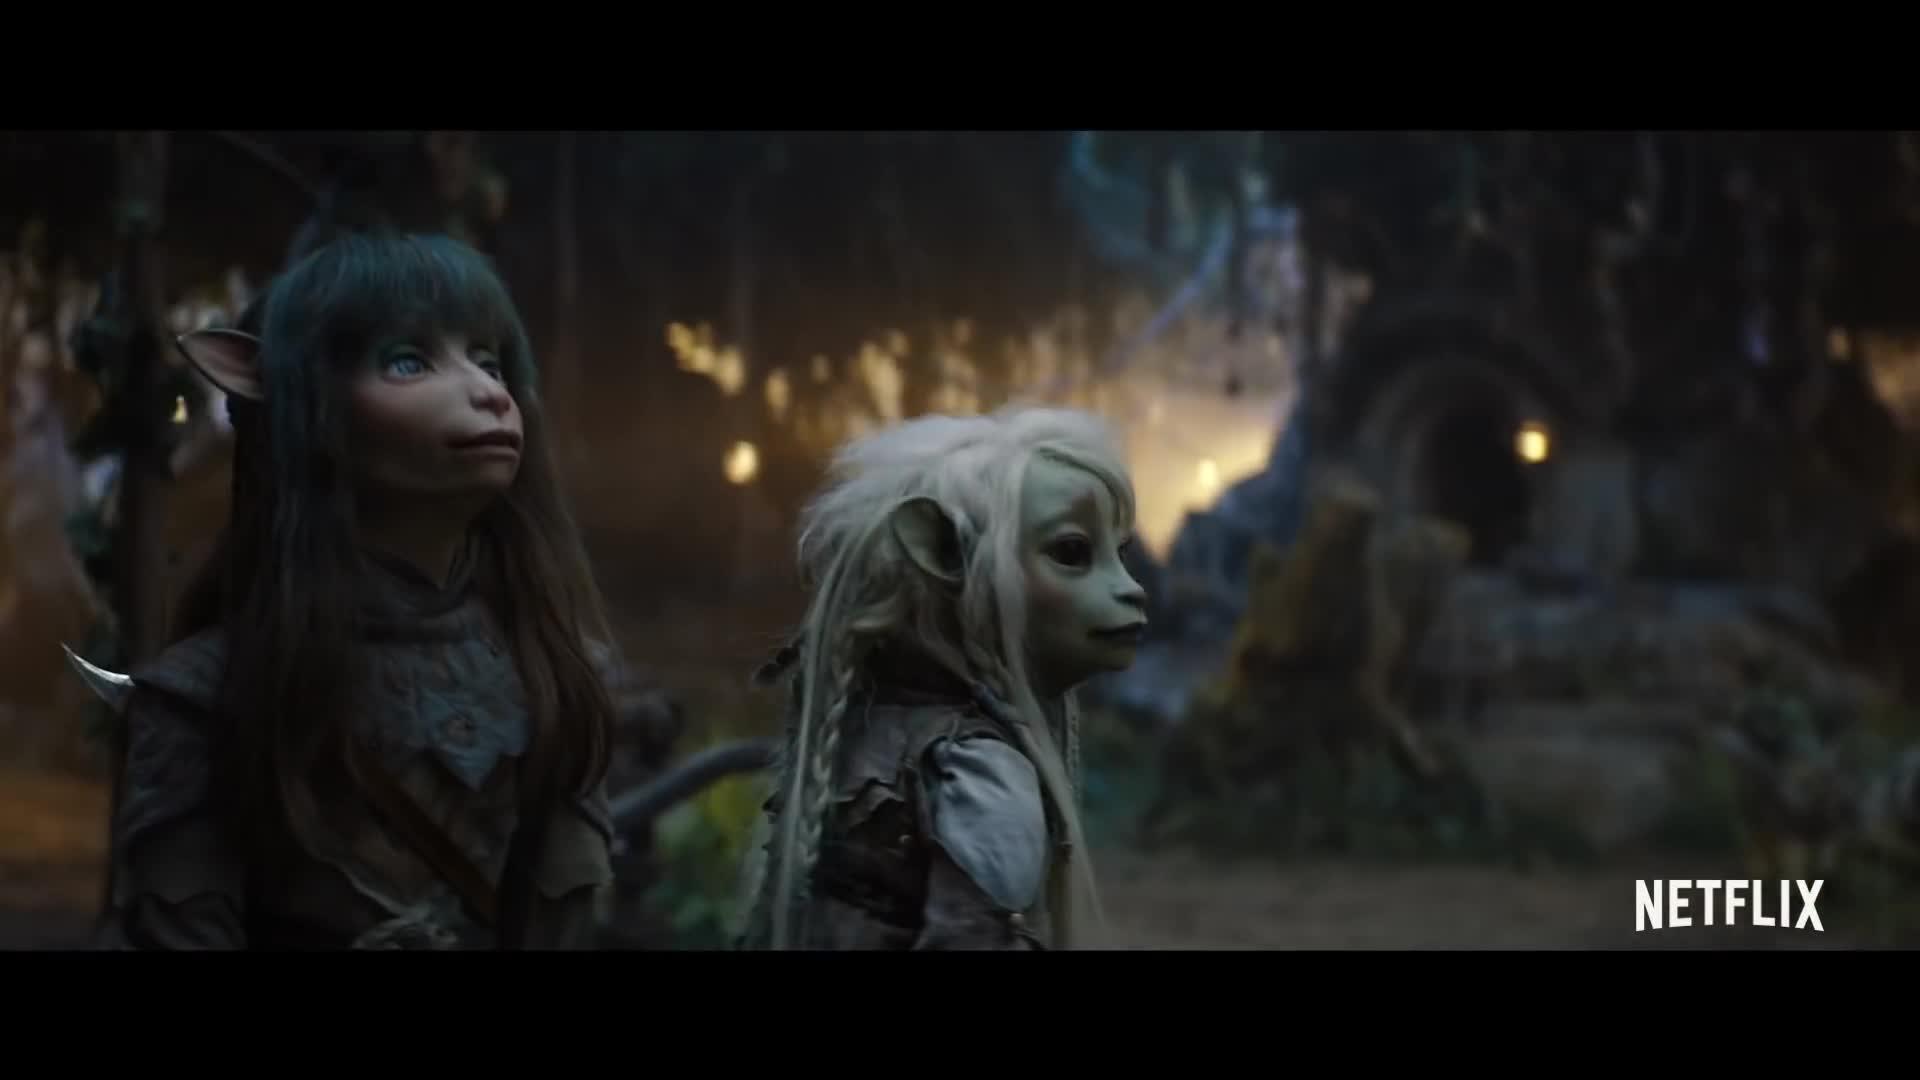 Trailer, Netflix, Serie, Teaser, Fantasy, Der dunkle Kristall, Ära des Widerstands, Der dunkle Kristall: Ära des Widerstands